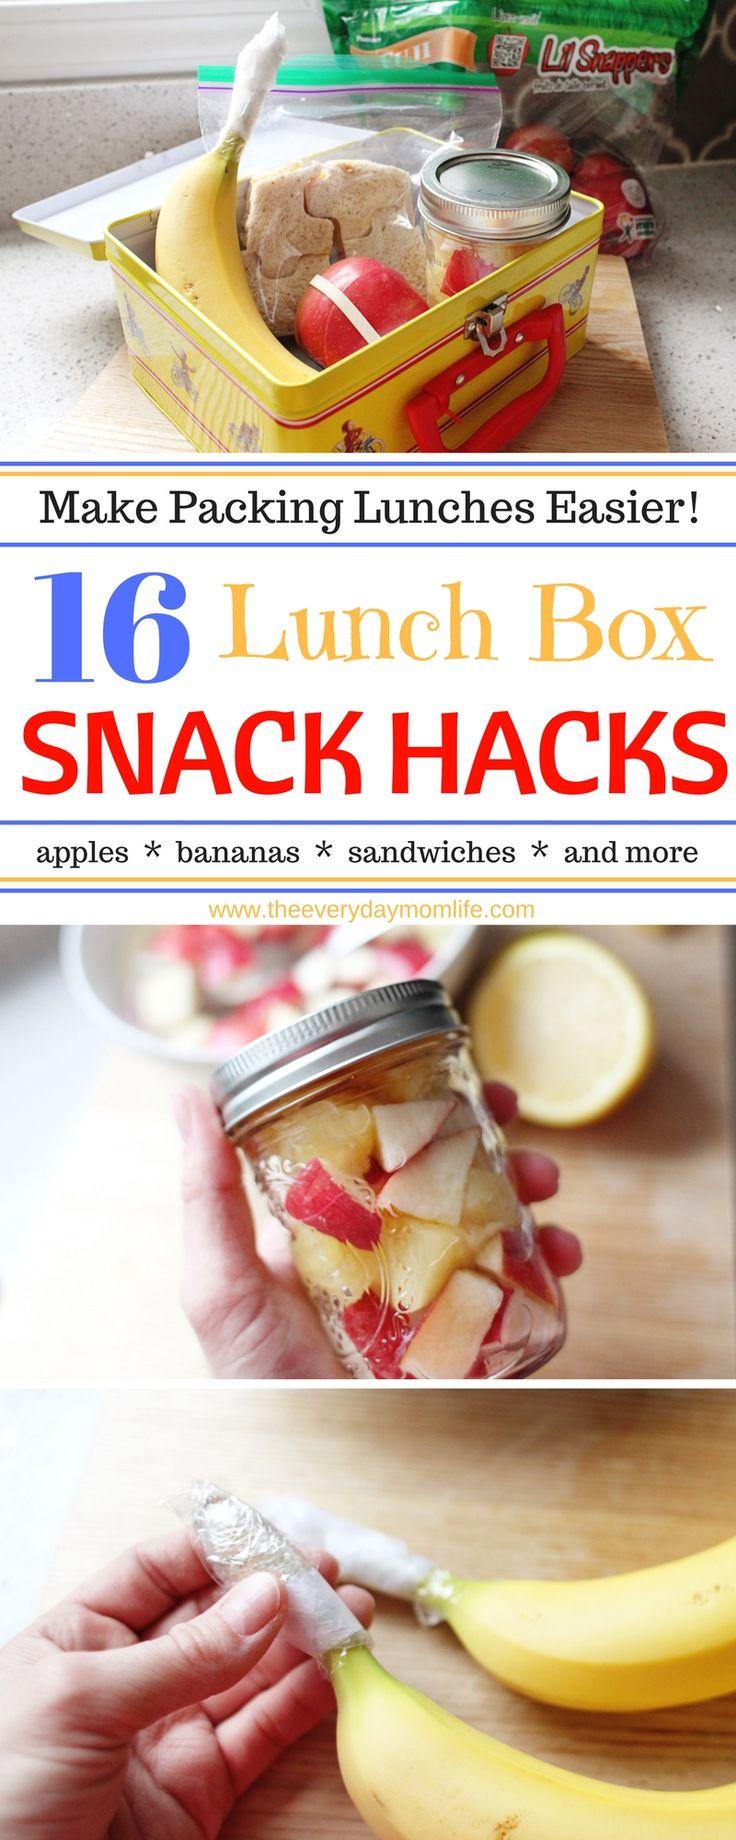 16 Lunch Box Hacks To Make Life Easier